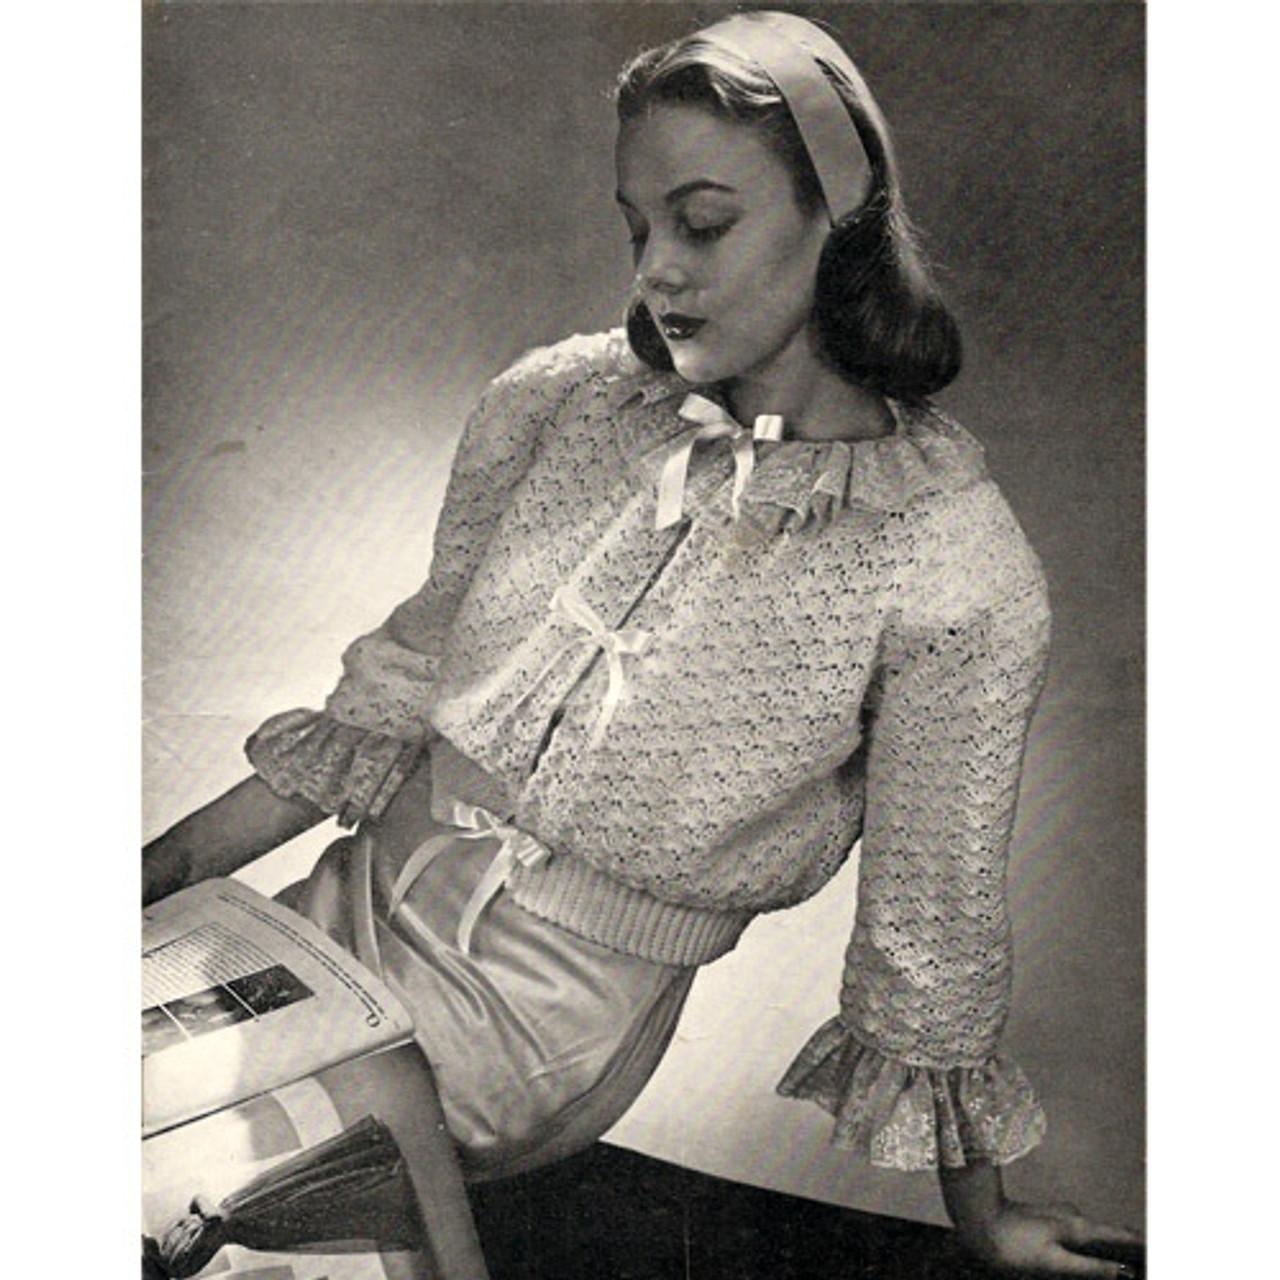 Vintage Crochet Bed Jacket pattern